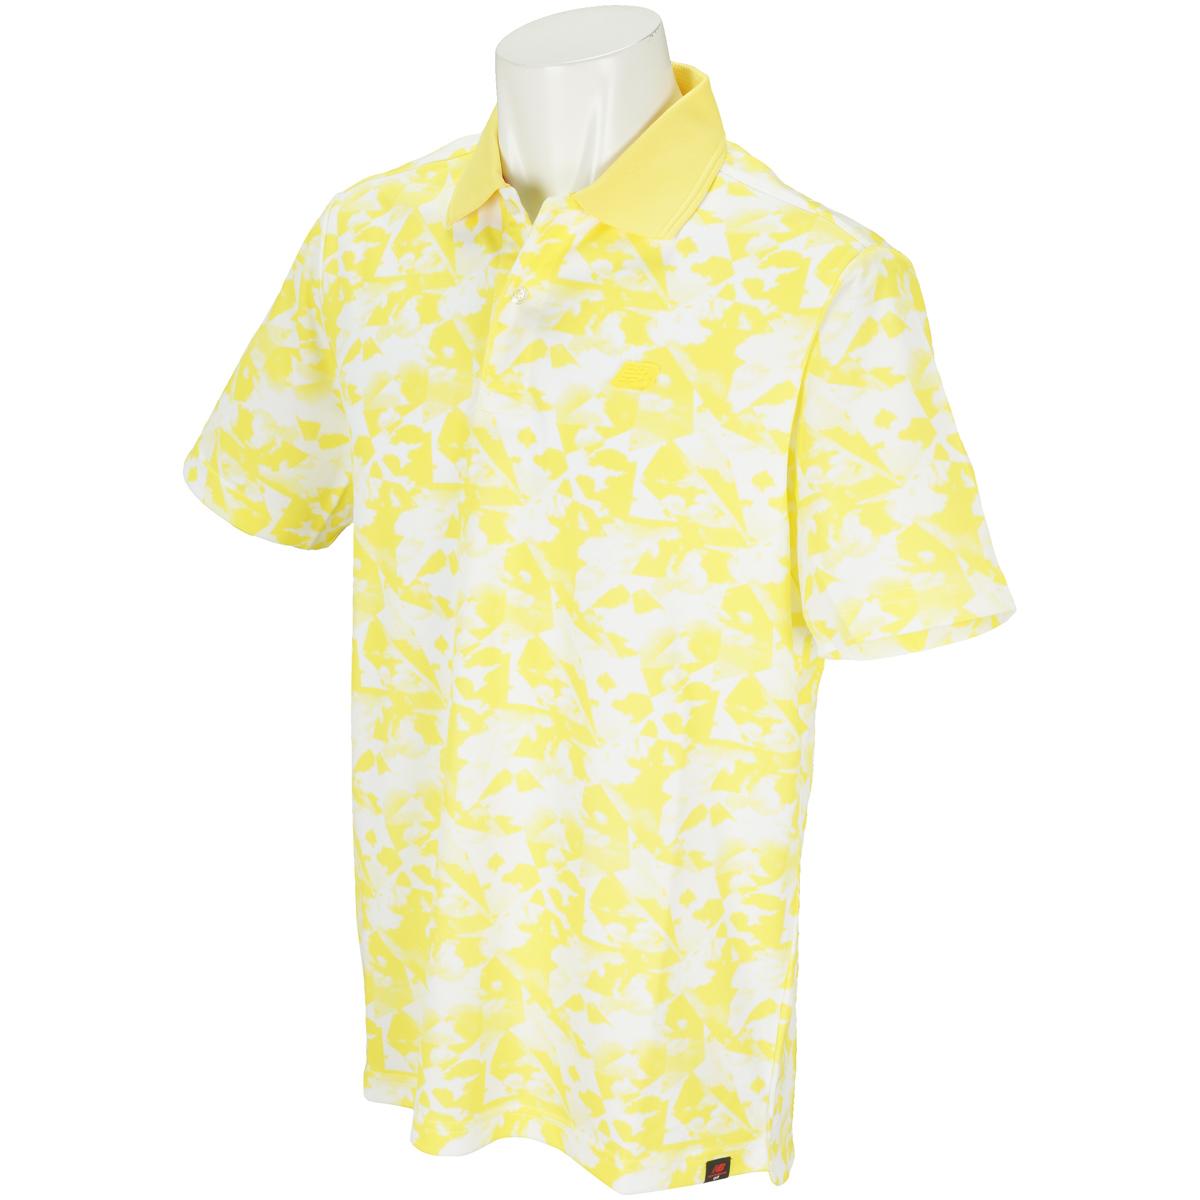 SPORT クラウドプリント 半袖ポロシャツ